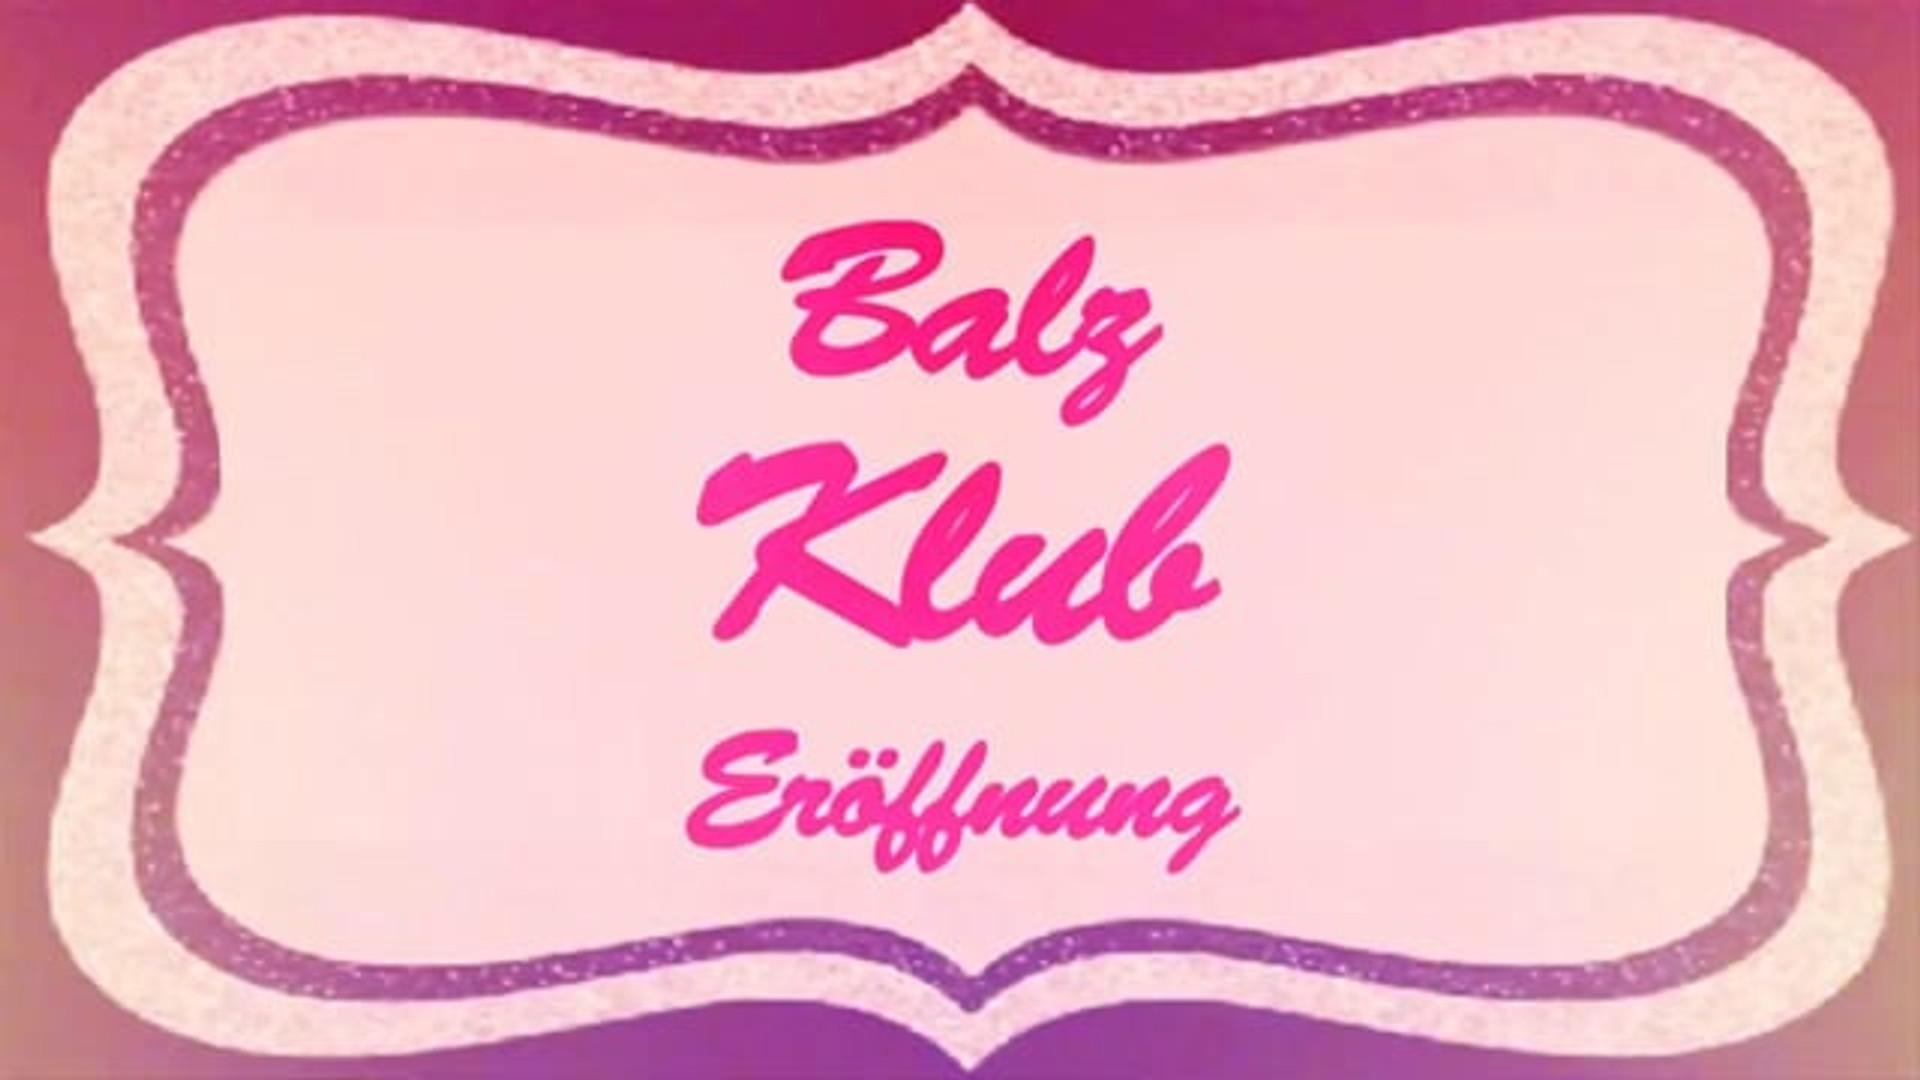 Balz Klub - Opening